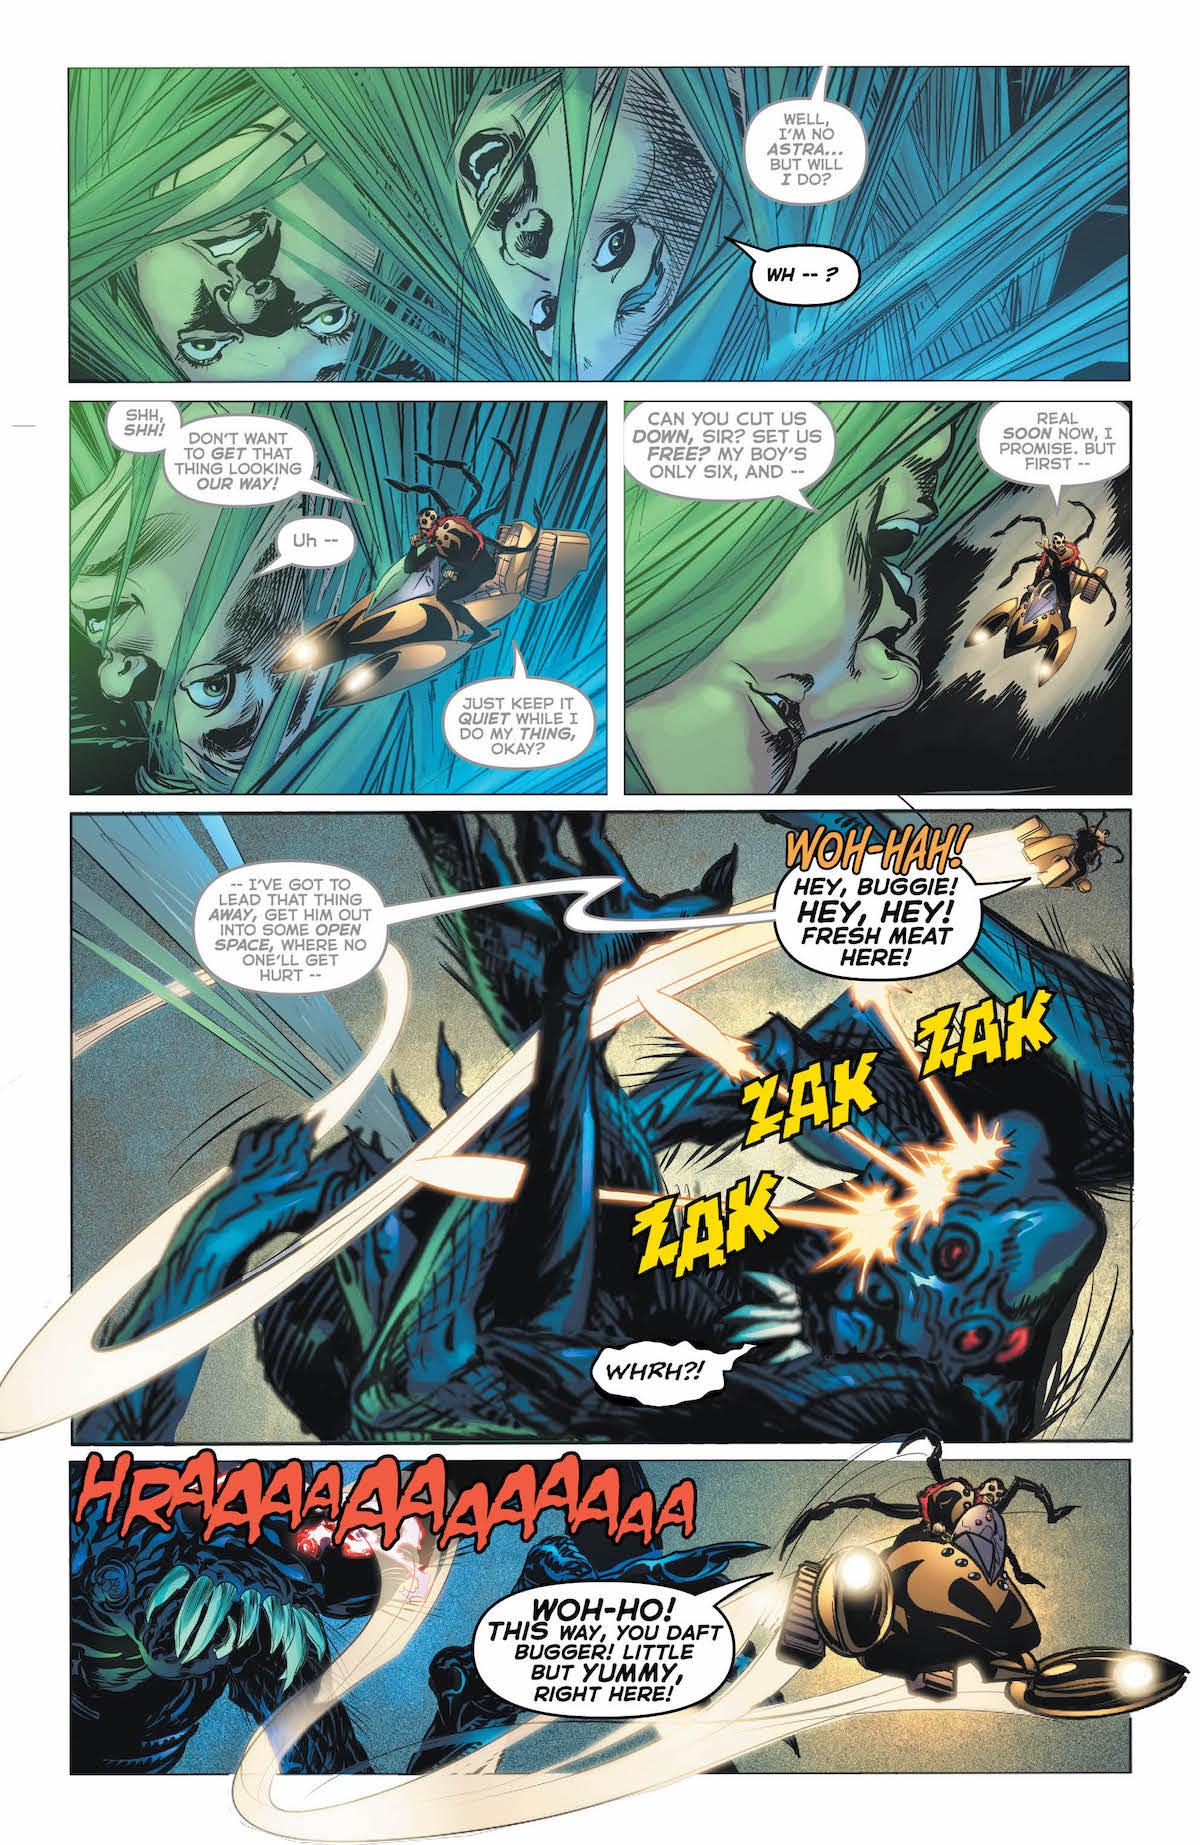 Astro City #51 page 6